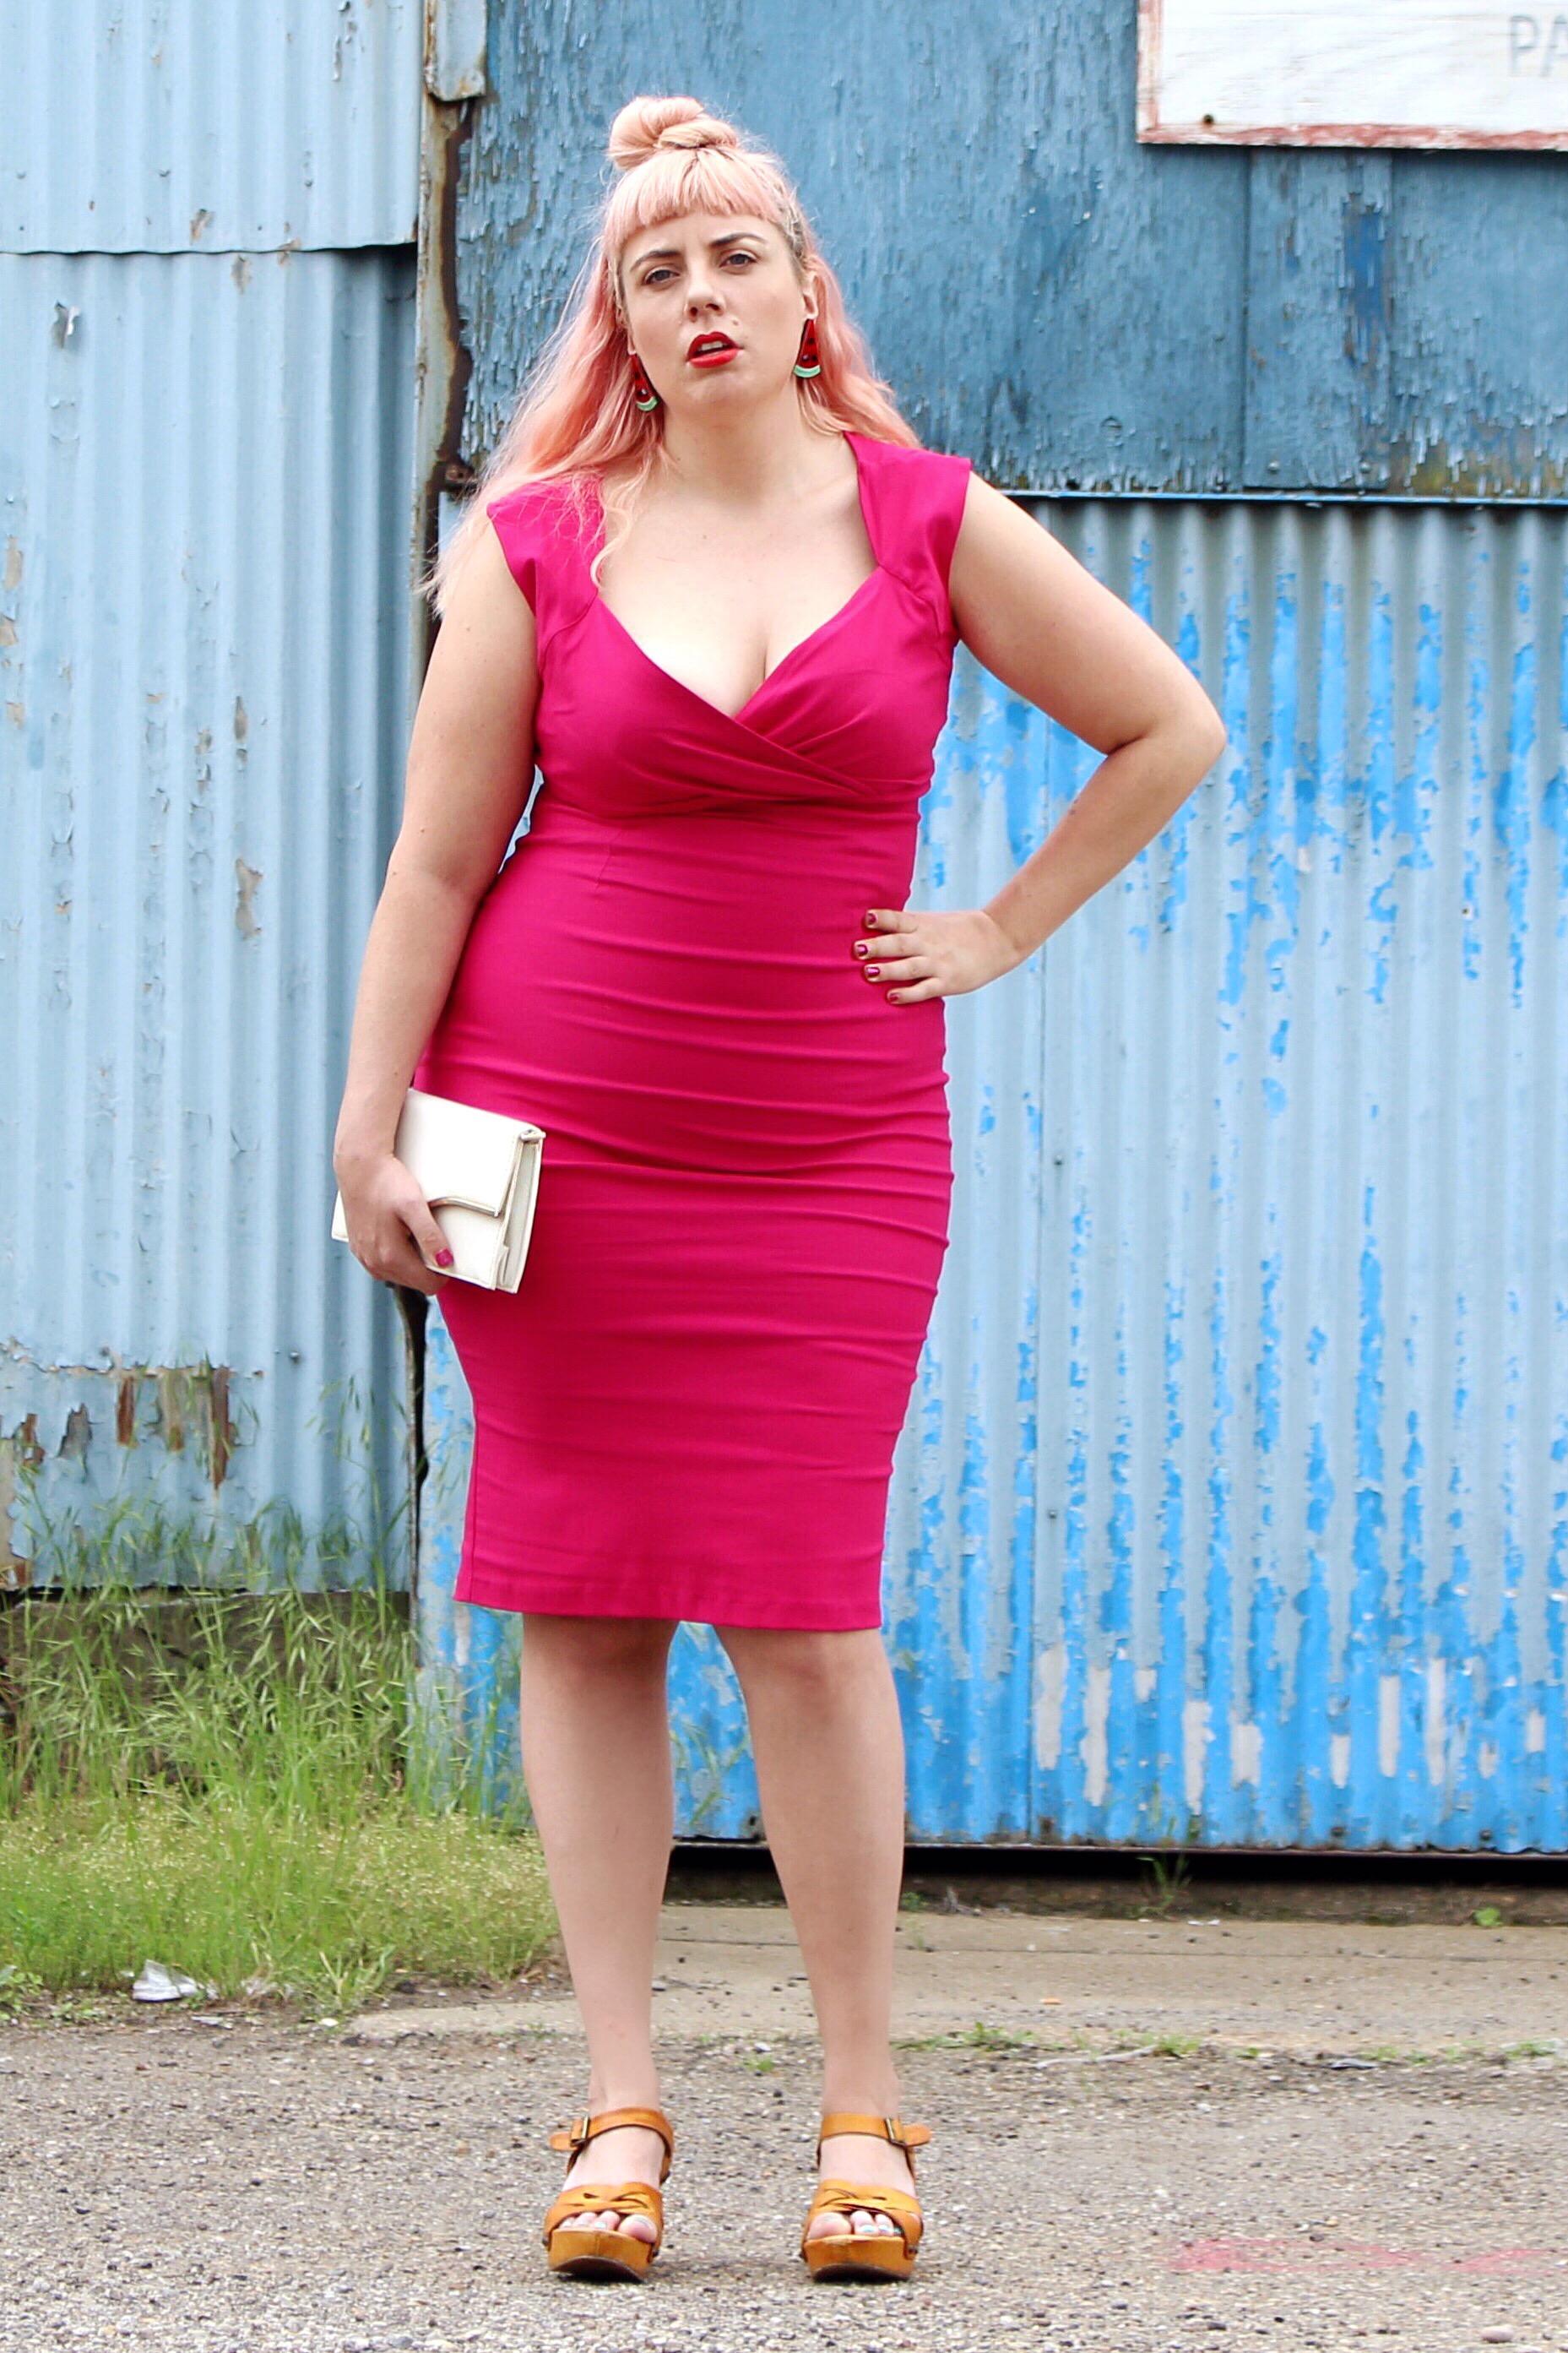 Plus Size Pinup Girl Clothing Dress